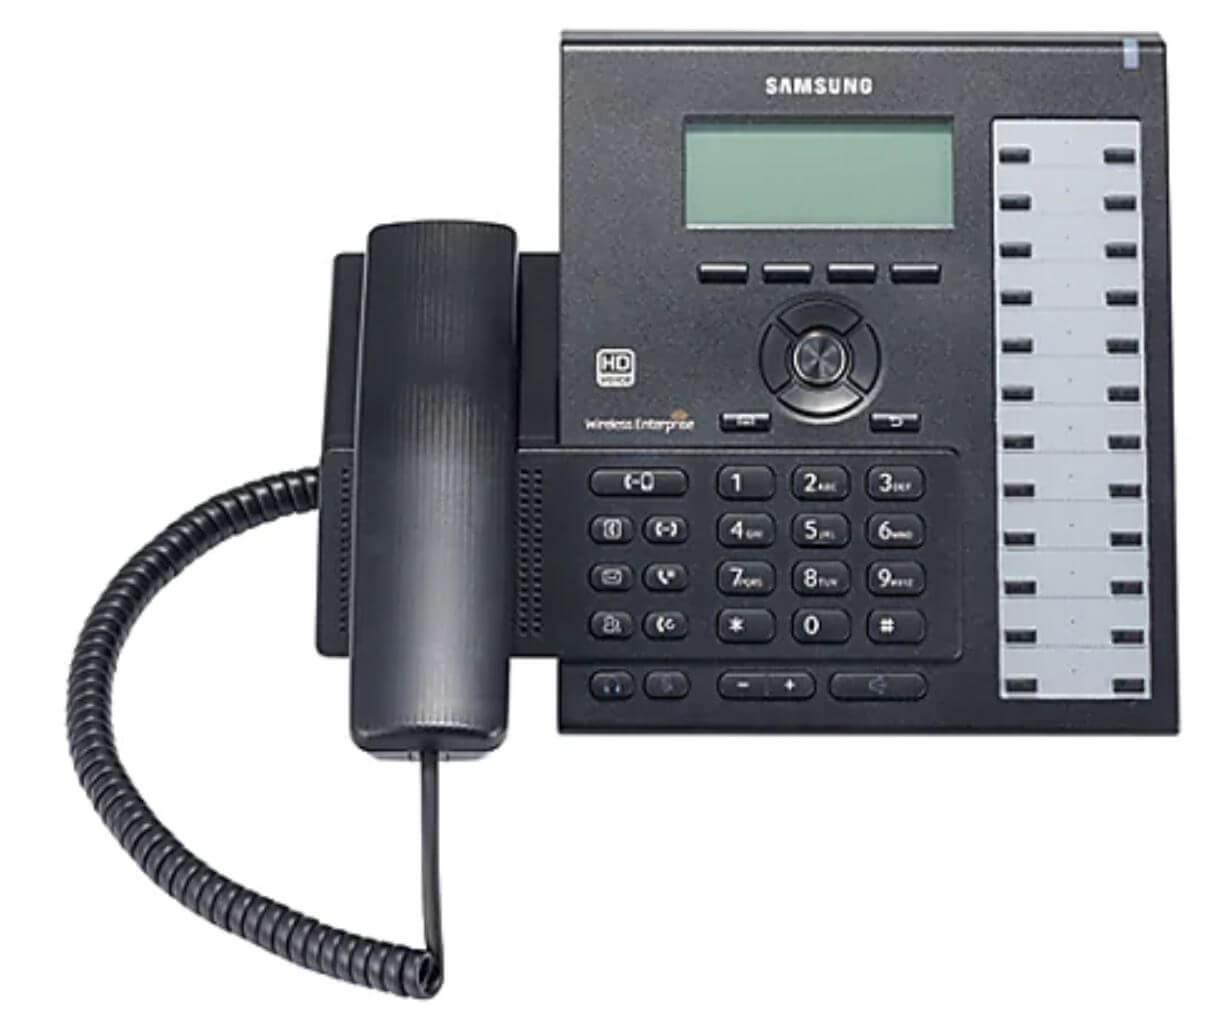 Samsung SMT-i6020 IP Phone Image